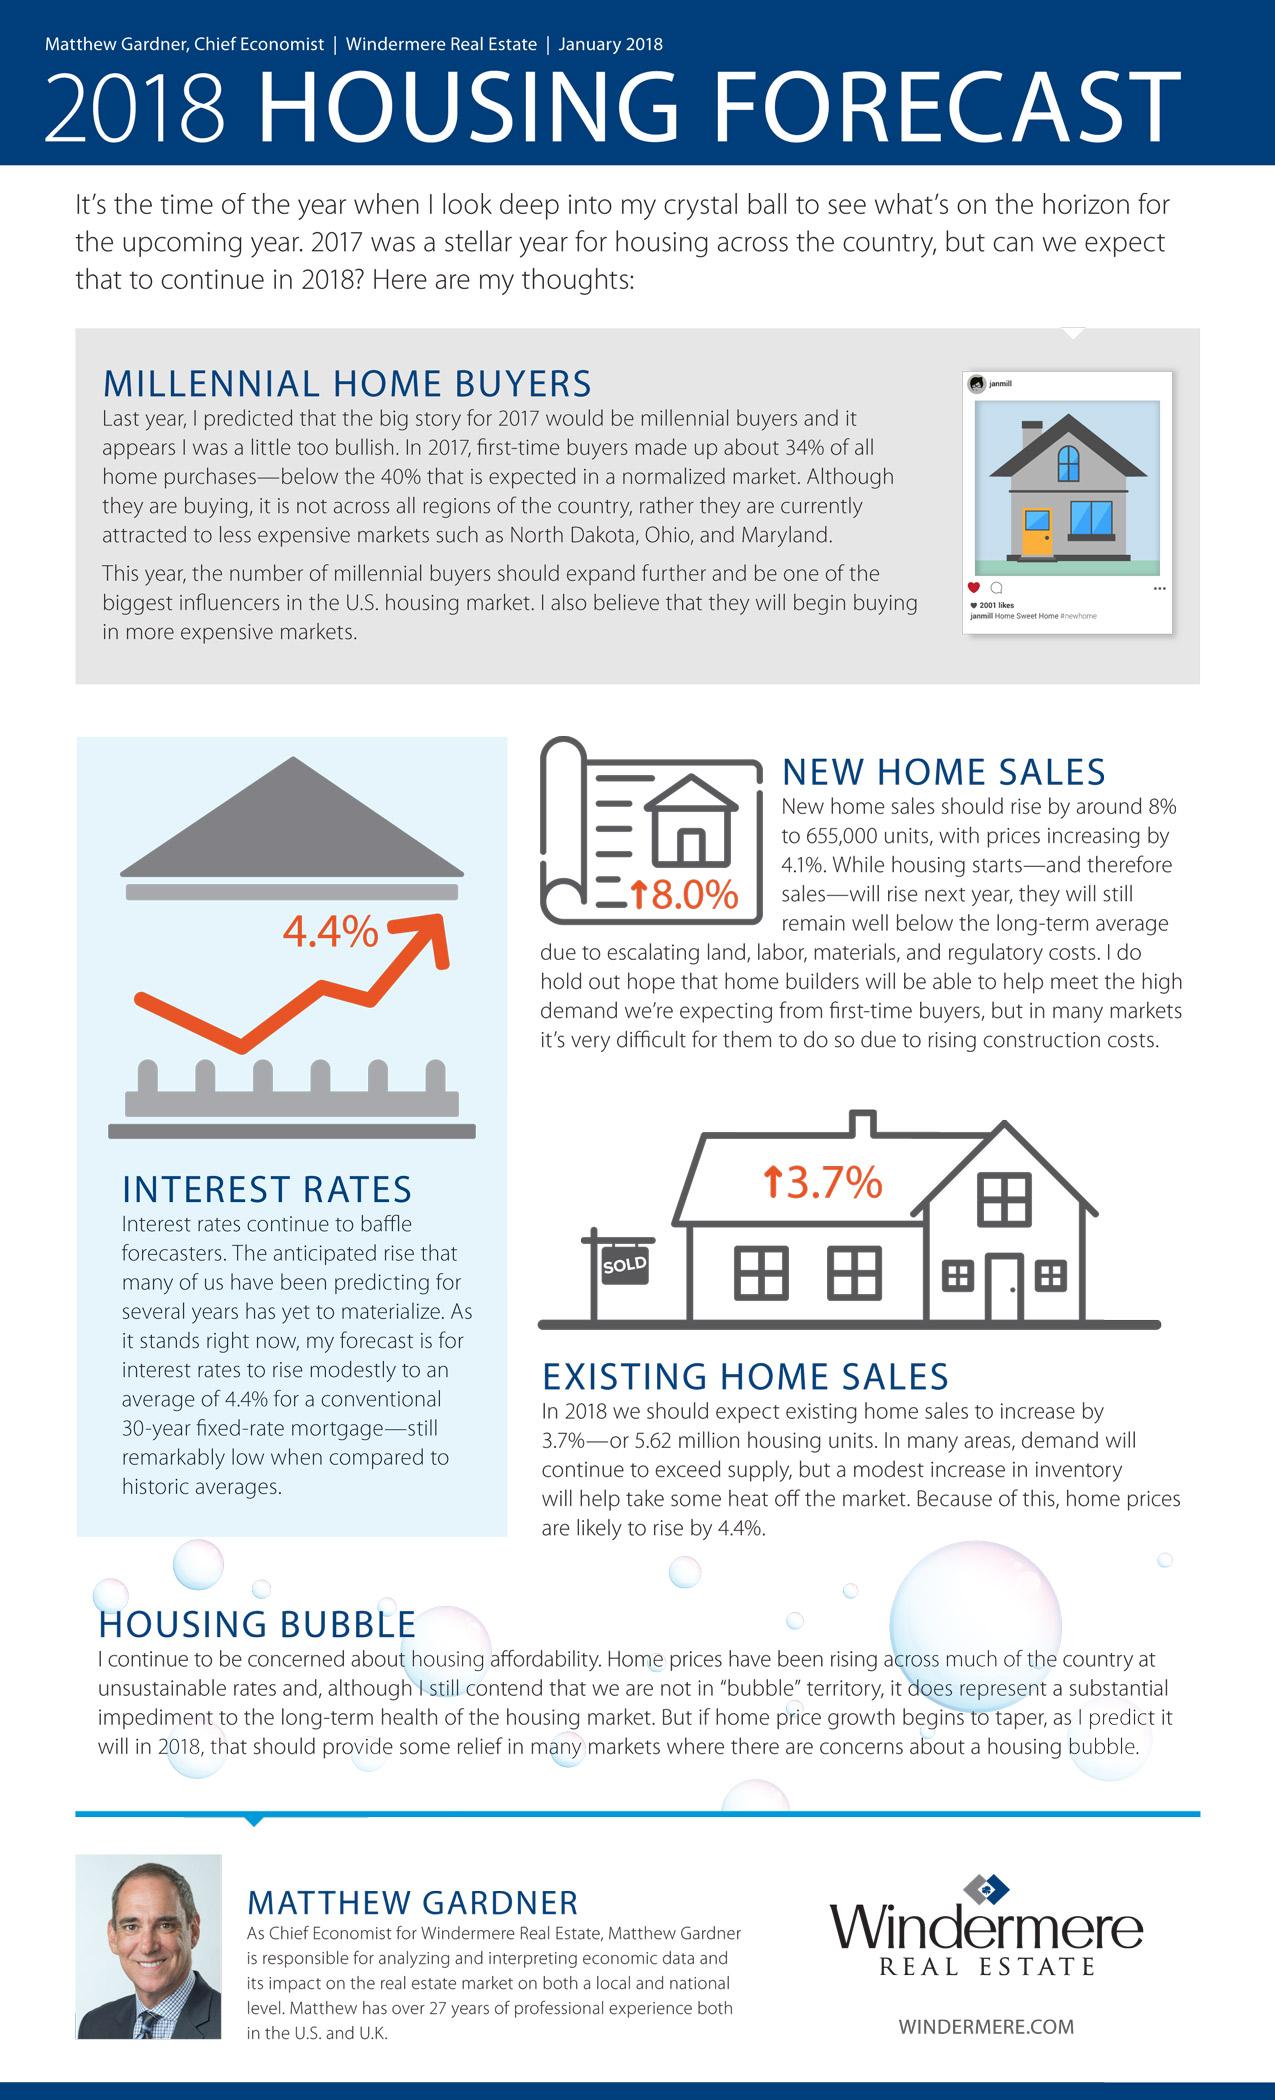 Matthew-Gardner-2018-Forecast--Bob-Richards-Issaquah-Sammamish-Real-Estate